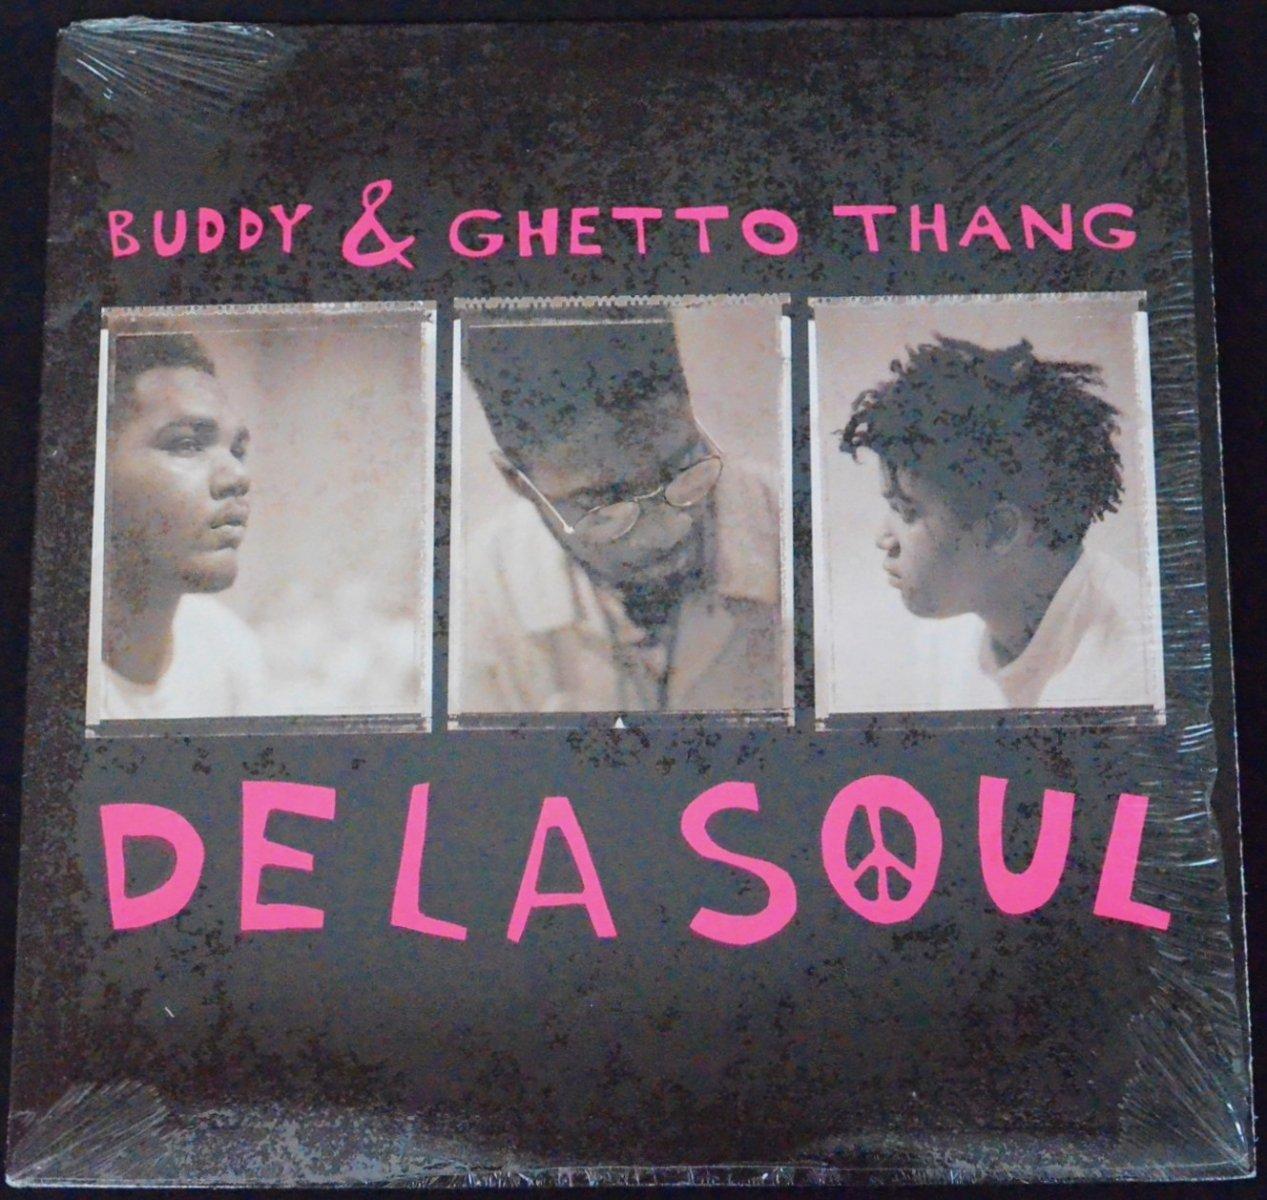 DE LA SOUL / BUDDY & GHETTO THANG (12